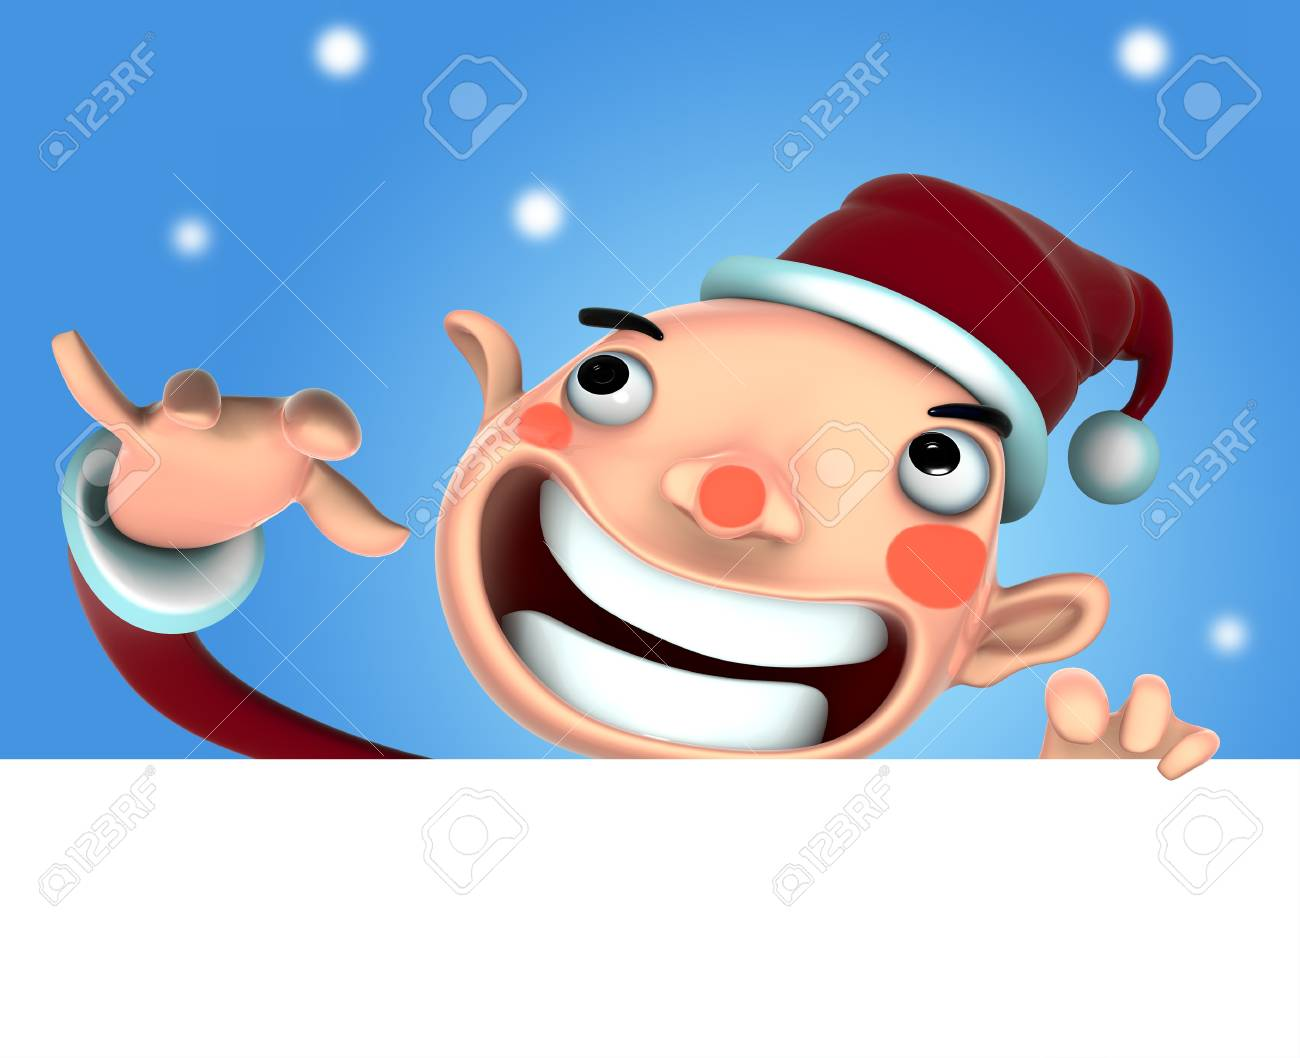 3d Santa Claus illustration smile holding a blank sign on snow background Stock Illustration - 15642697